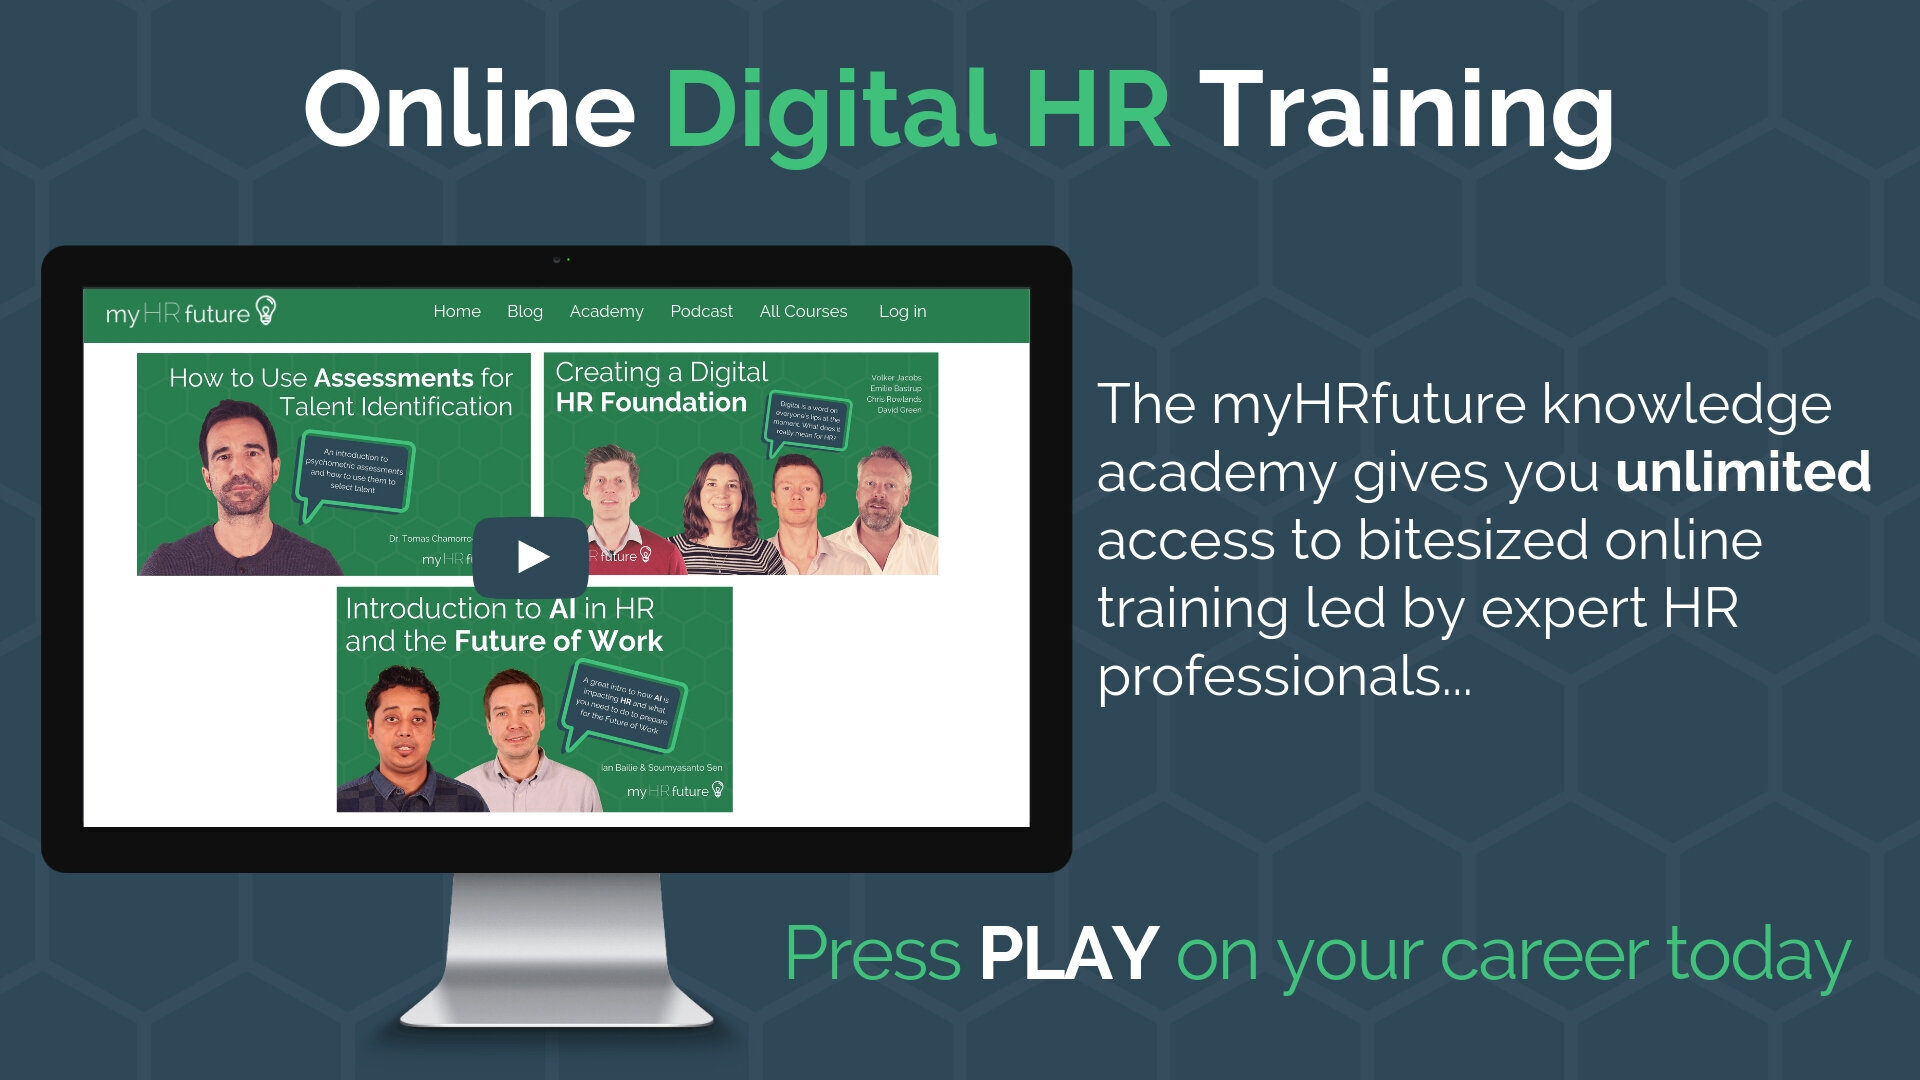 https://www.myhrfuture.com/online-digital-hr-training